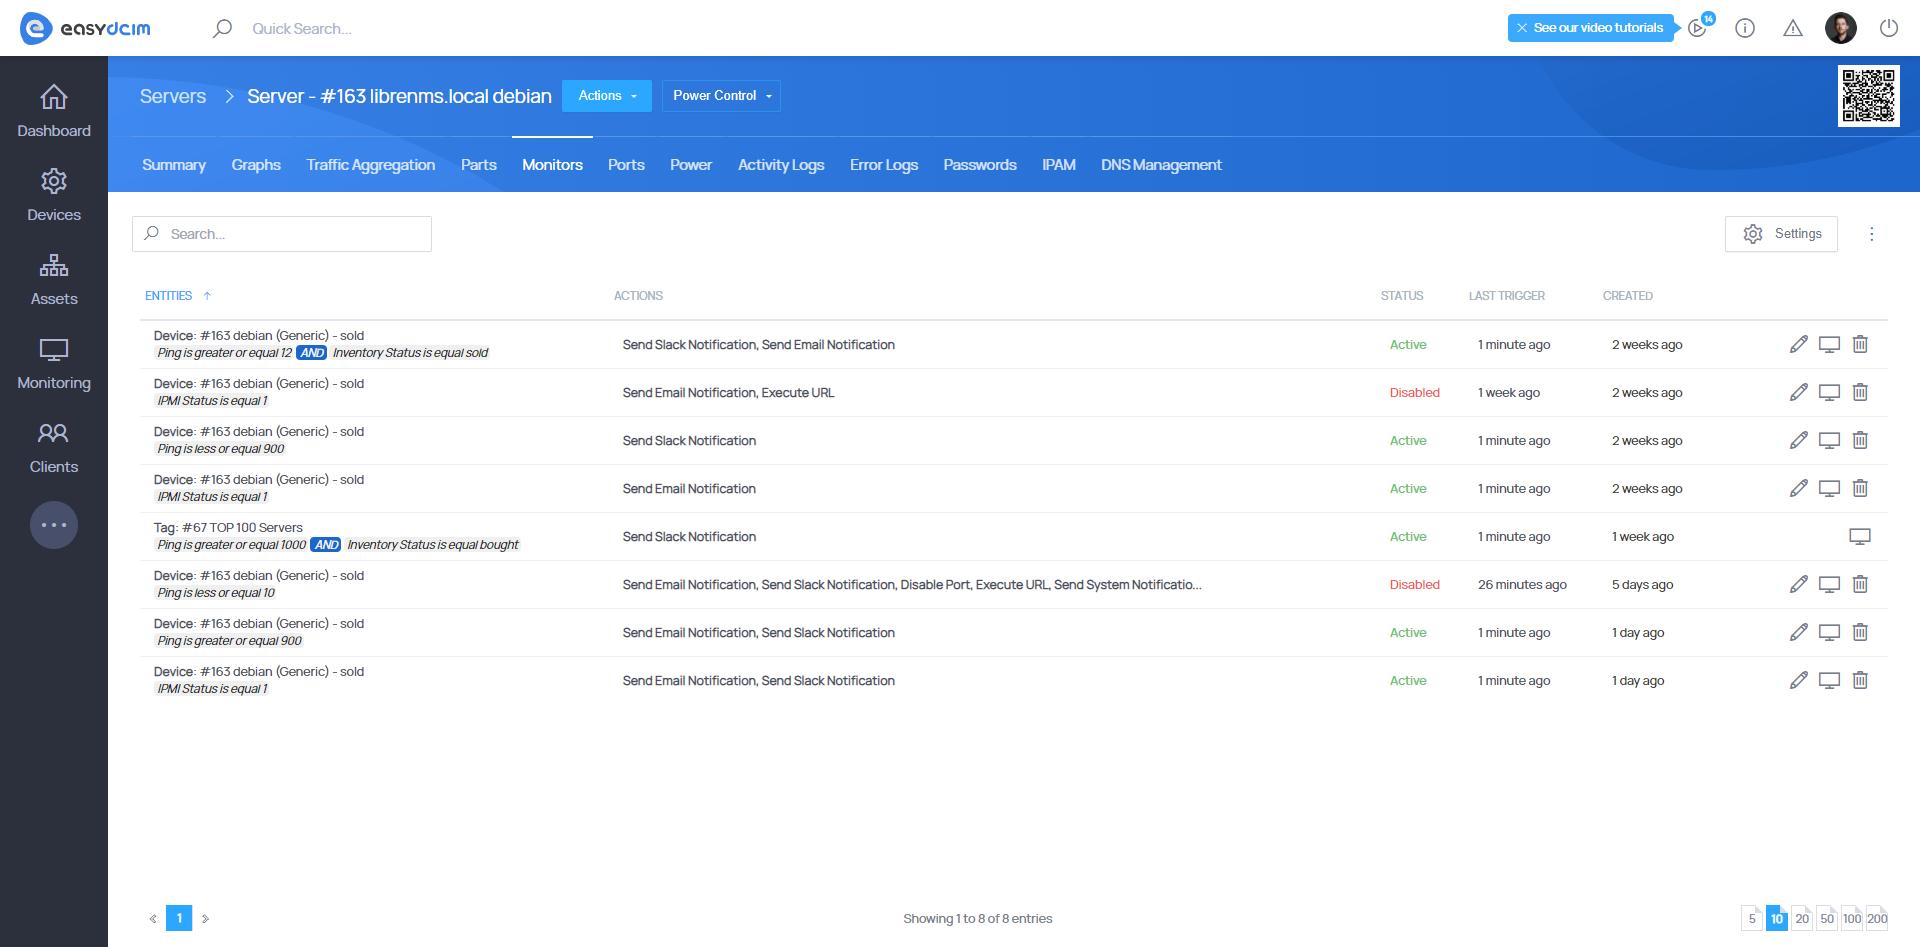 Advanced Monitoring Devices - EasyDCIM v1.7.0